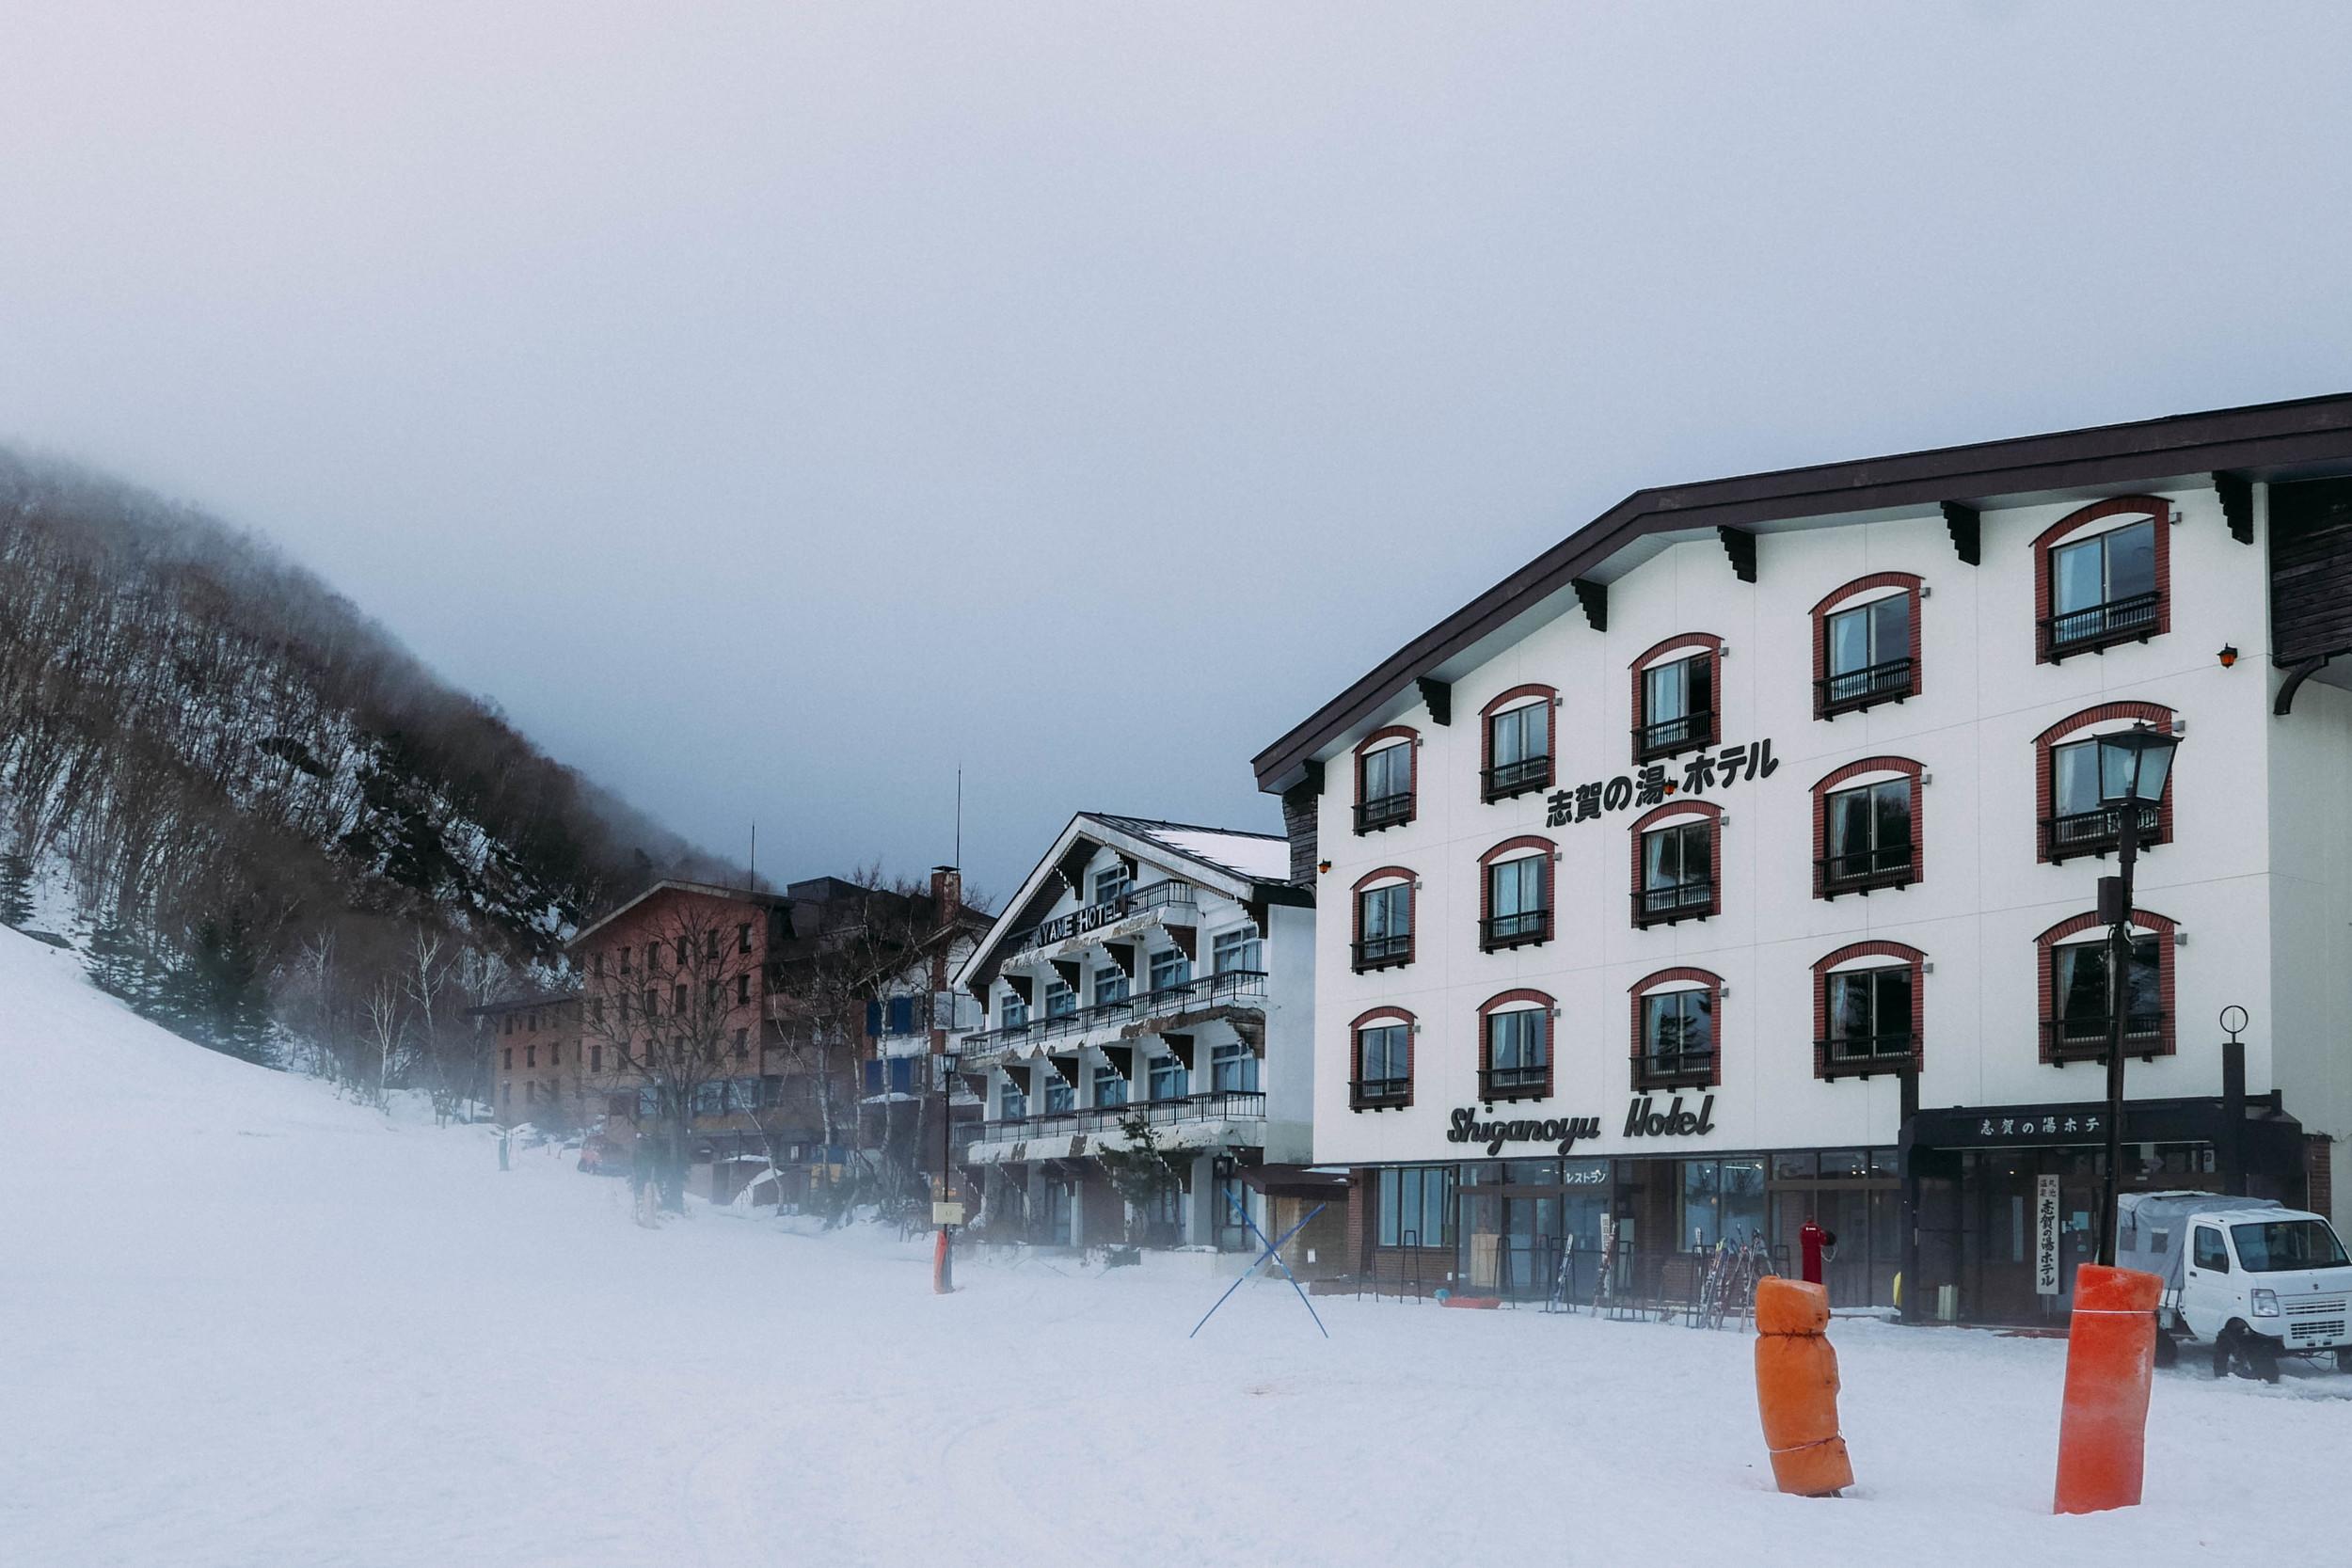 Ski-to-door accommodations in Sun Valley.